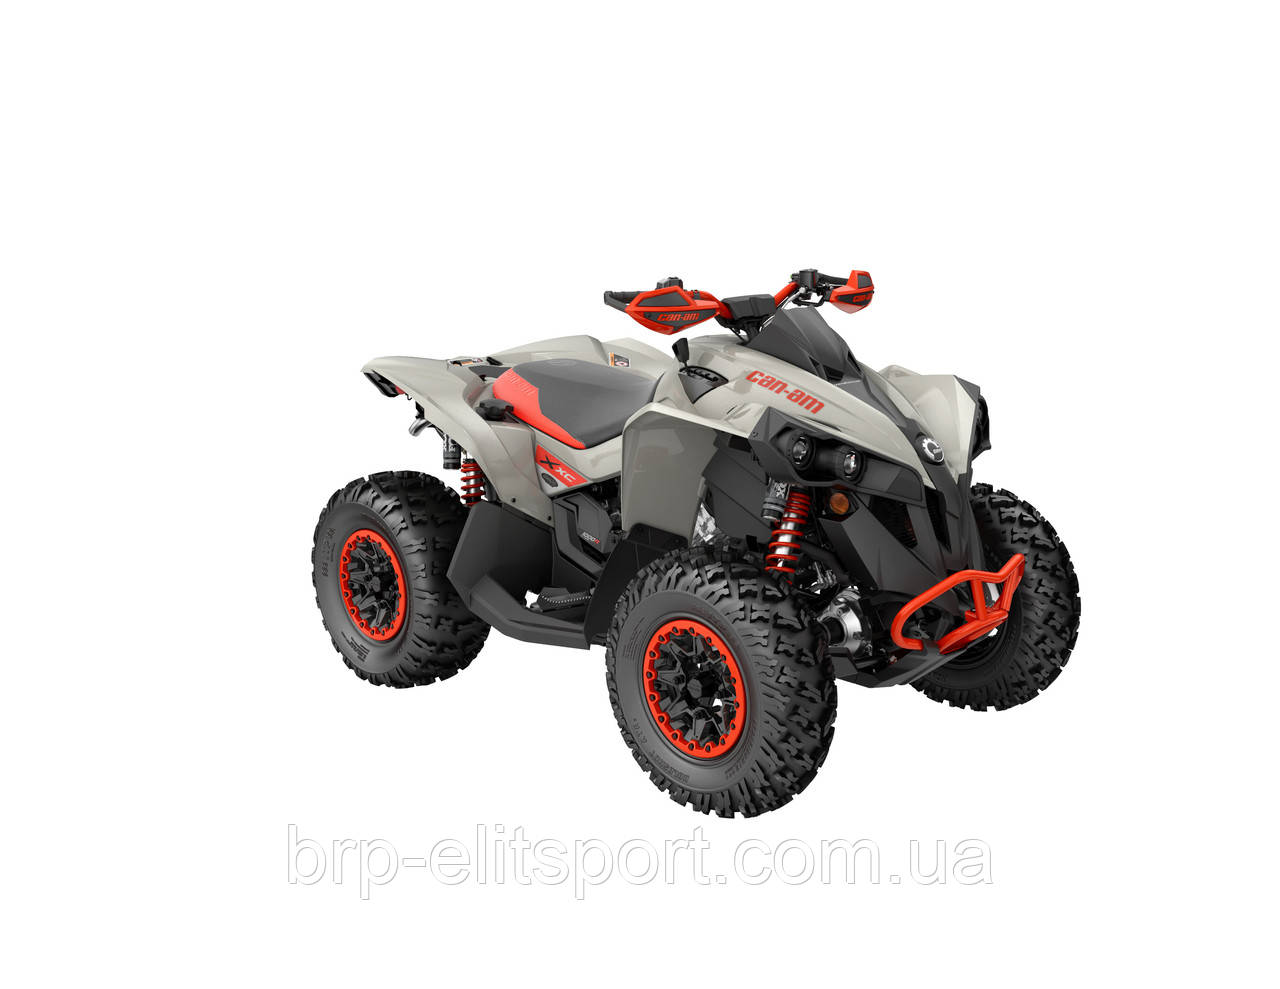 Renegade X XC 1000R (2022)